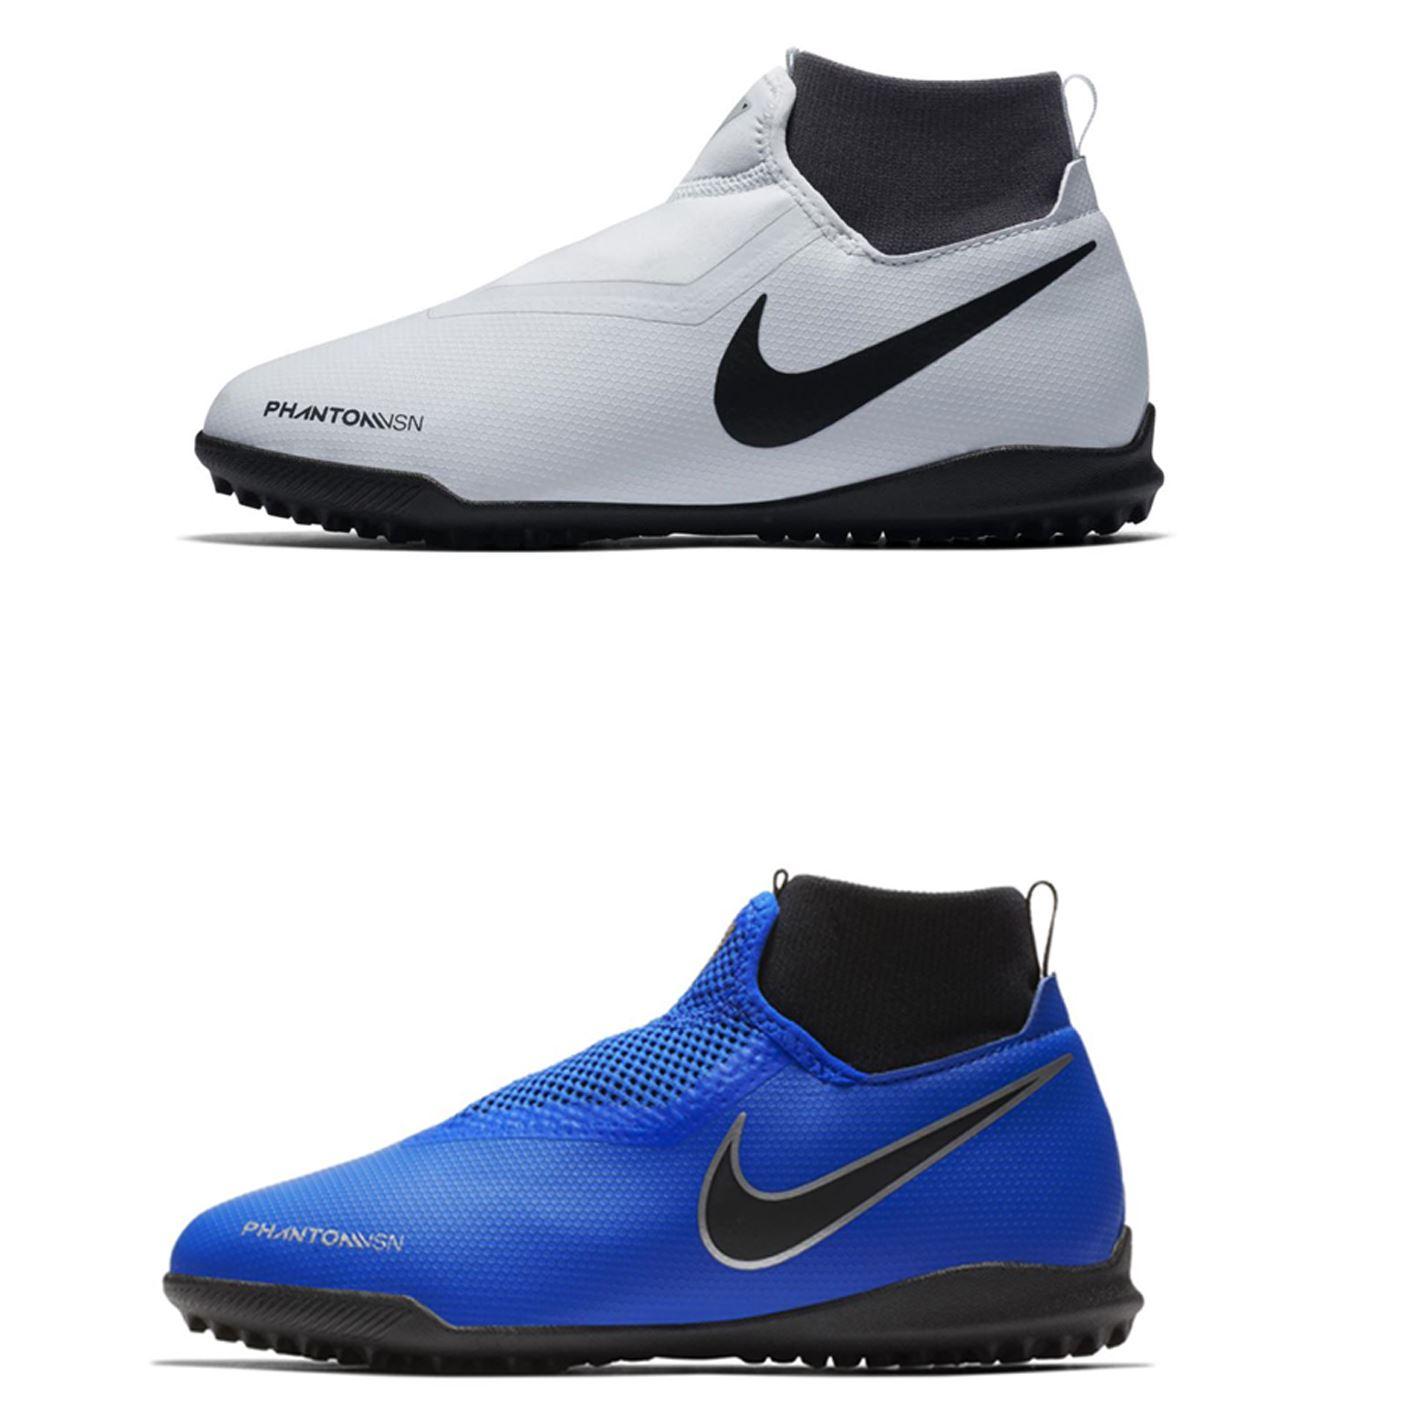 3c51a858234 ... Nike Phantom Vision Academy DF Astro Turf Football Trainers Juniors  Soccer Shoes ...